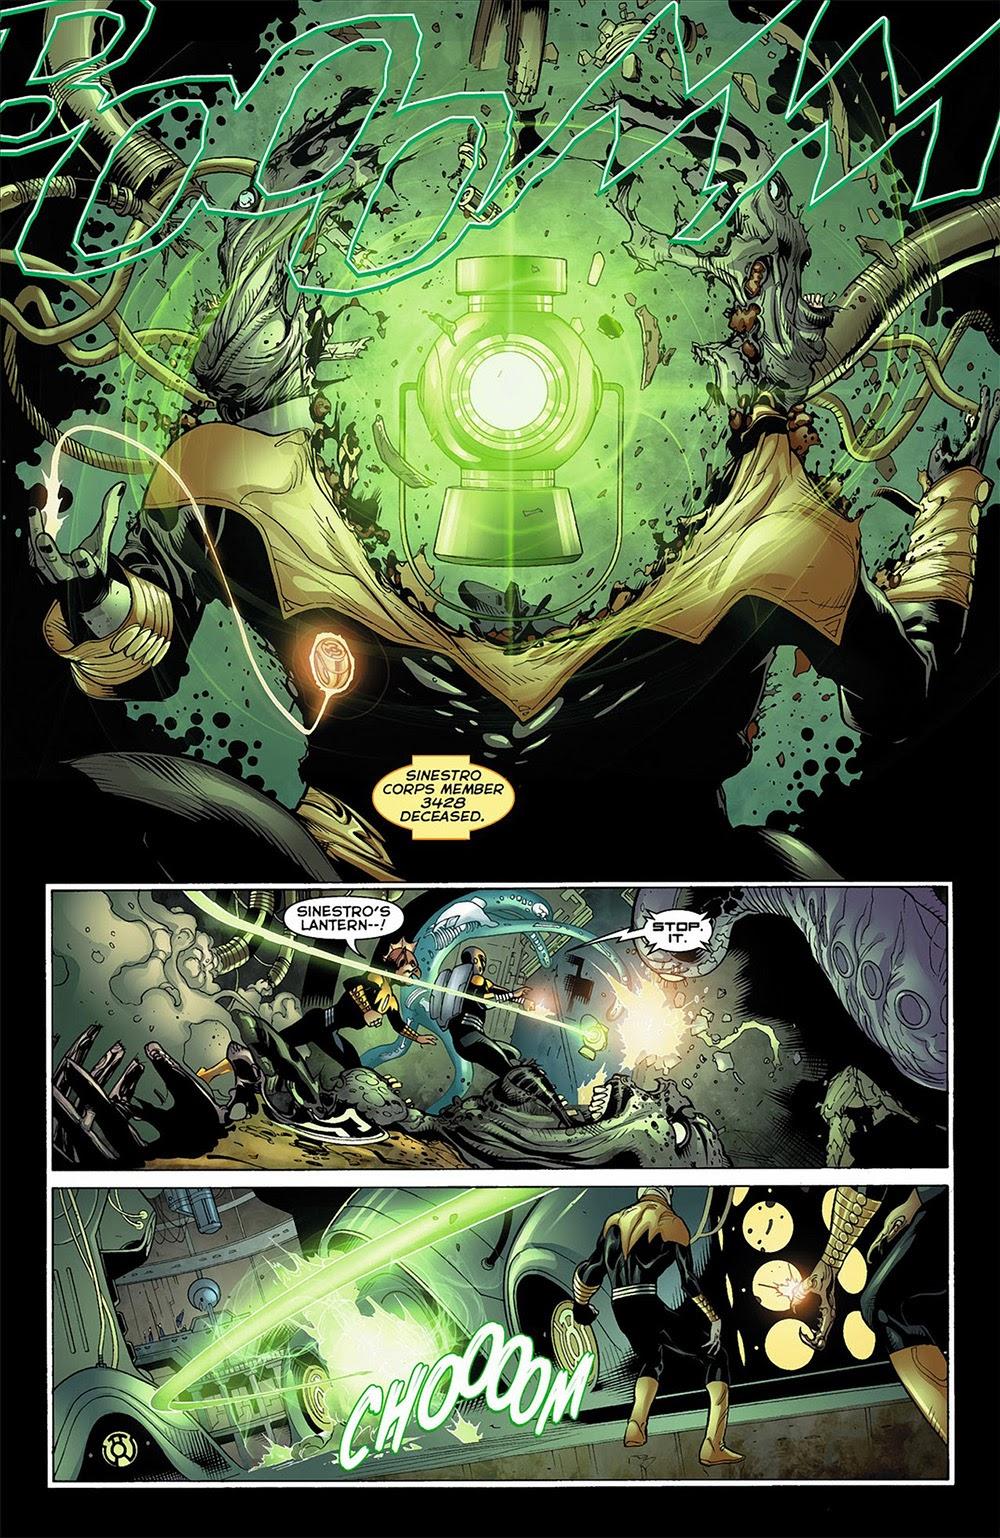 green lantern v5 005 2012 vietcomic net reading comics for free